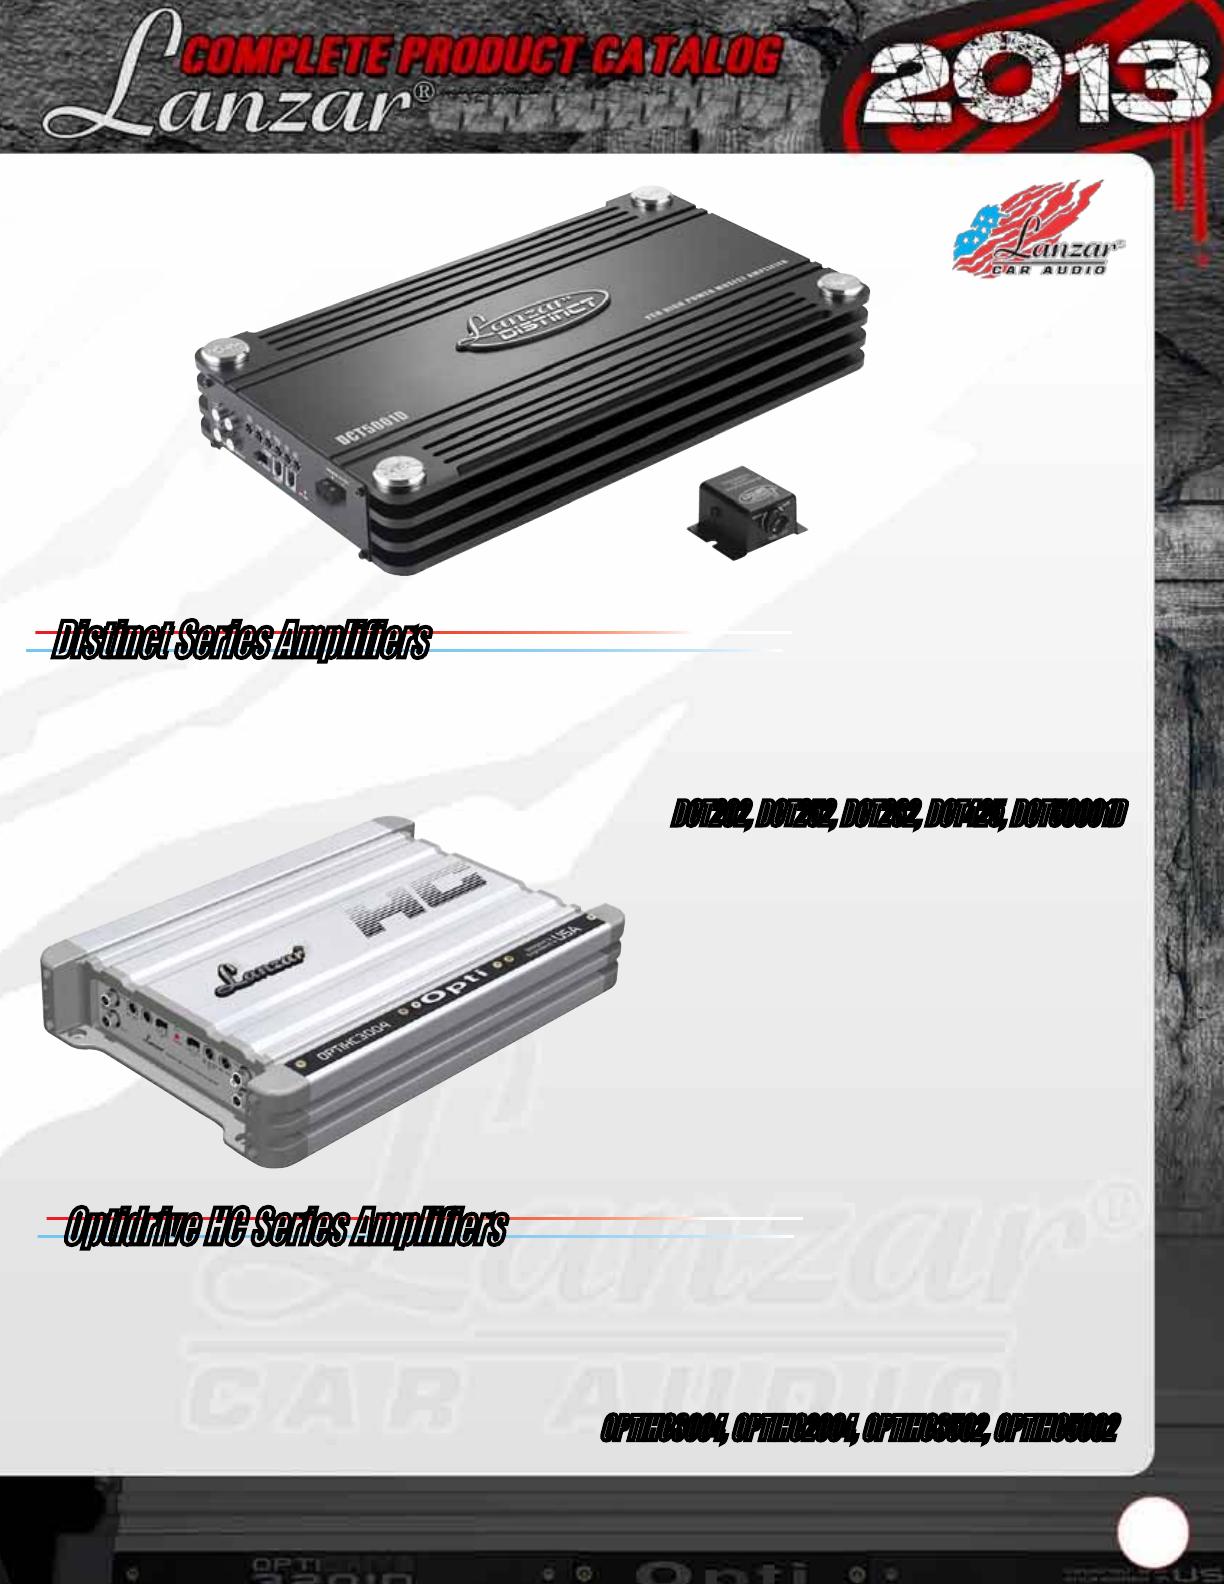 Lanzar Speakers Installation Instructions Max Mxa224 Catalog Lanzarr Ampkit4 4 Gauge Contaq Amplifier Wiring Kit Youve Been Missing